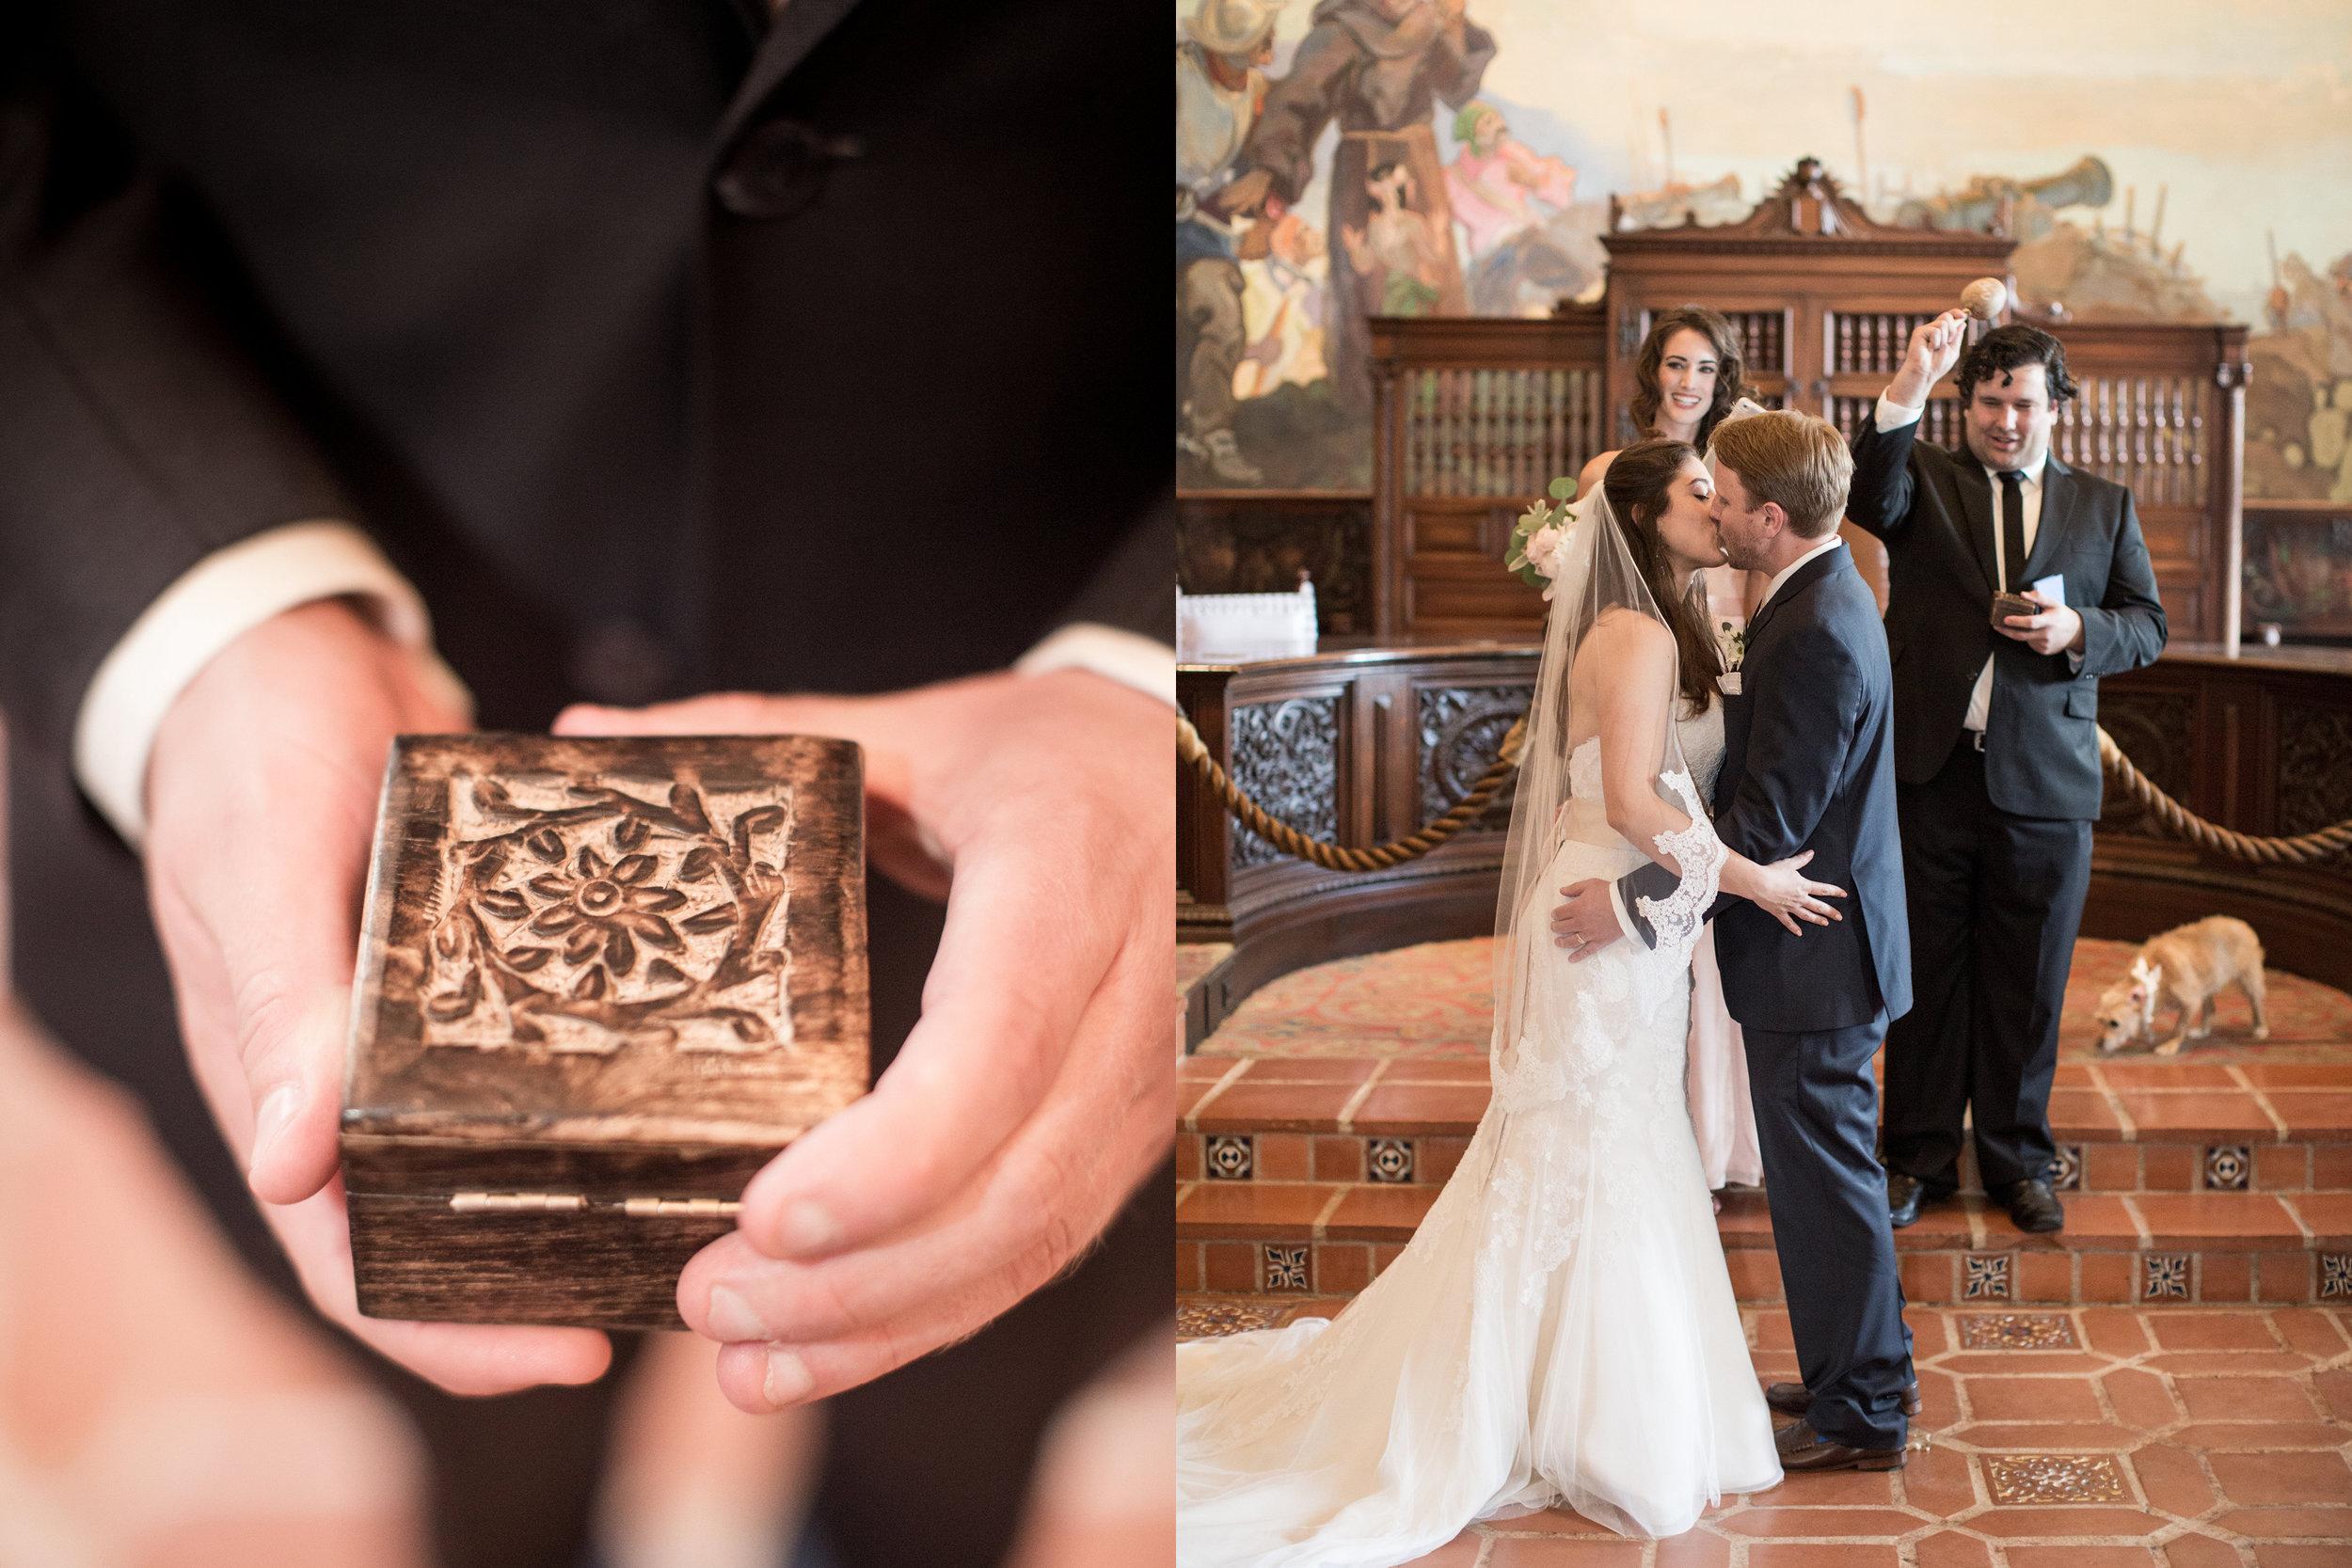 santa-barbara-elopement-wedding-planning-planner-coordinator-day-of-elope-courthouse-sunken-garden-clock-tower-mural-room (4).jpg